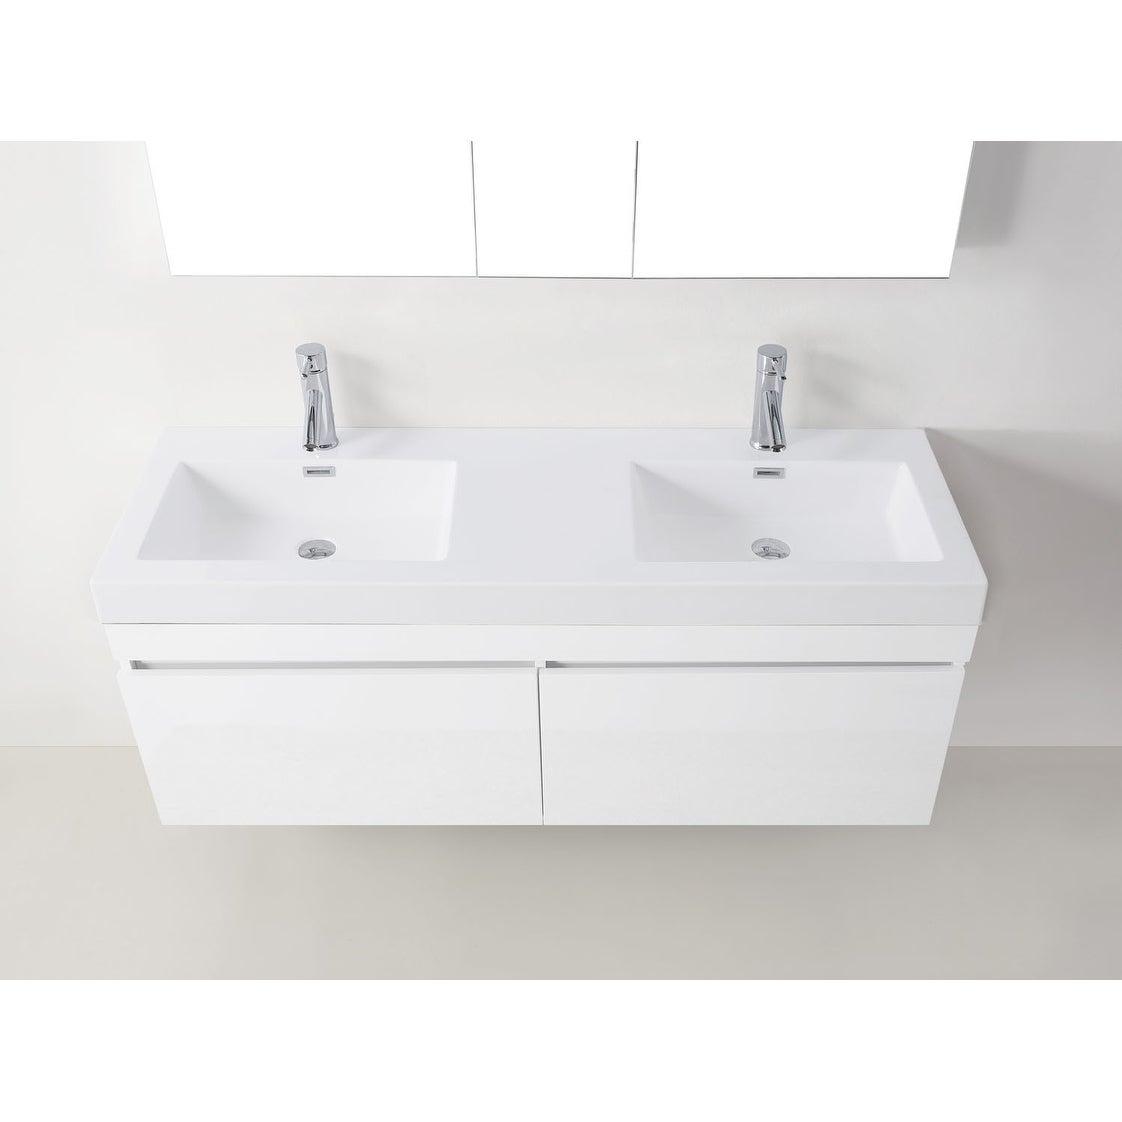 Shop Zuri 55-inch Ultra Modern Double Vanity Set Faucet Options No ...